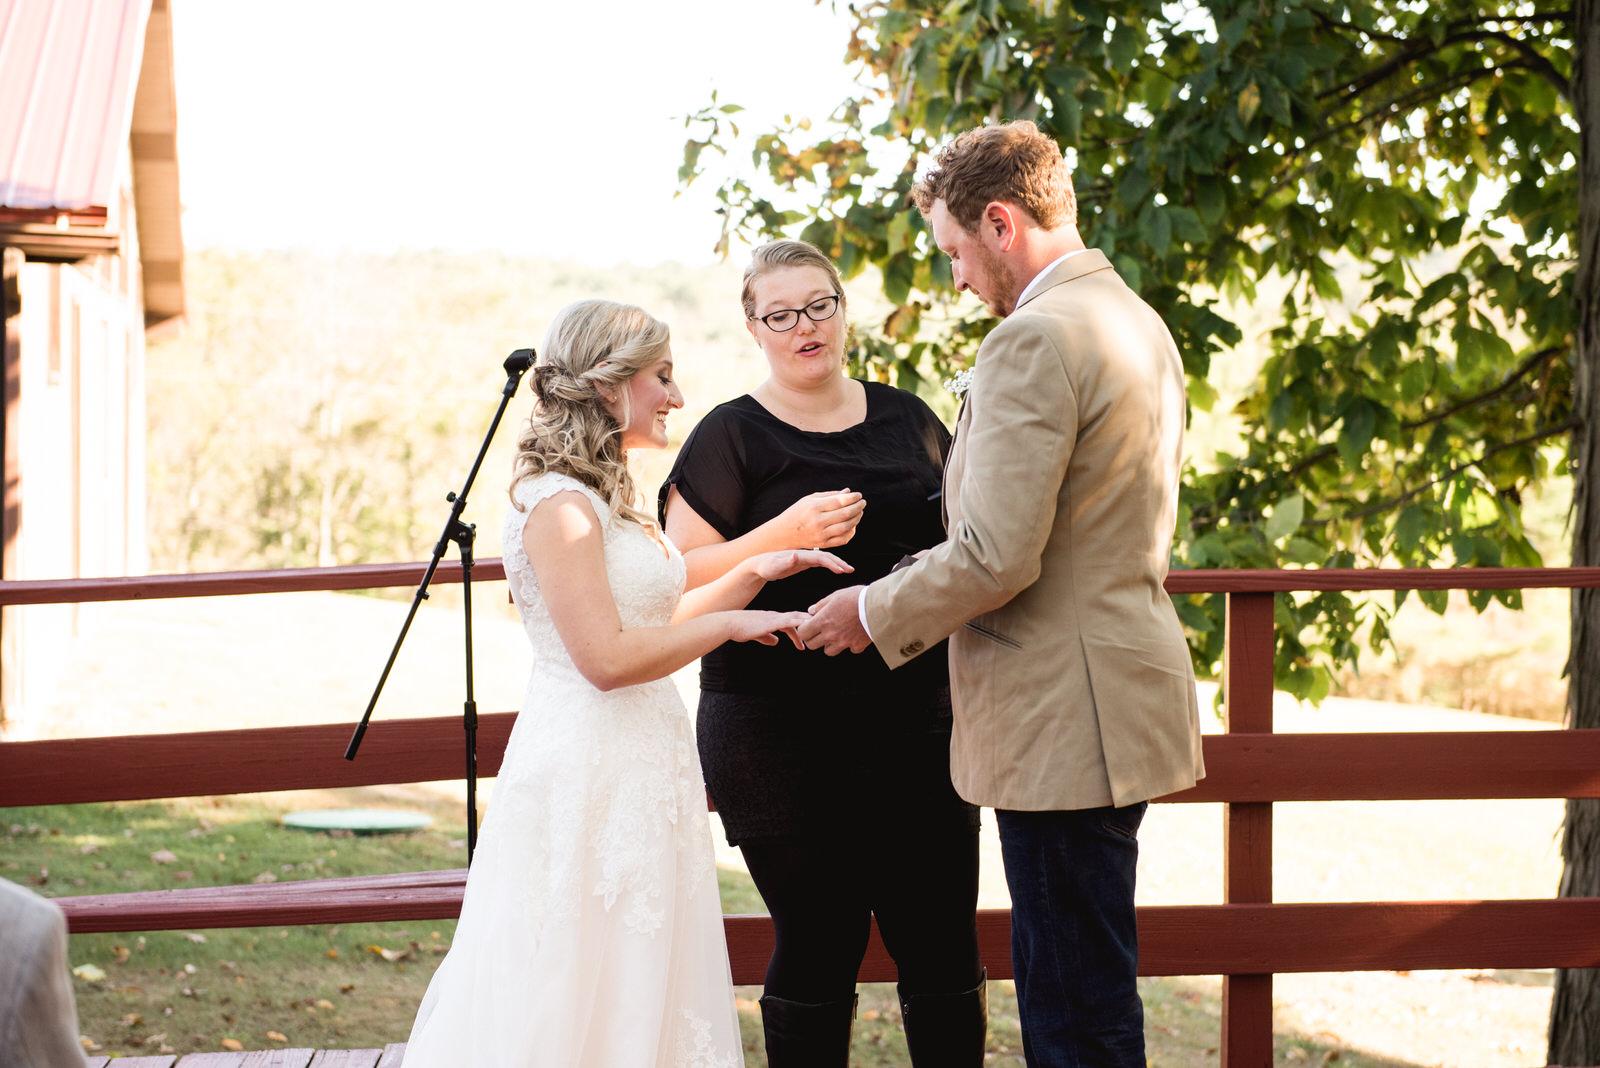 wedding_at_red_fox_winery_wedding_photographer018.jpg